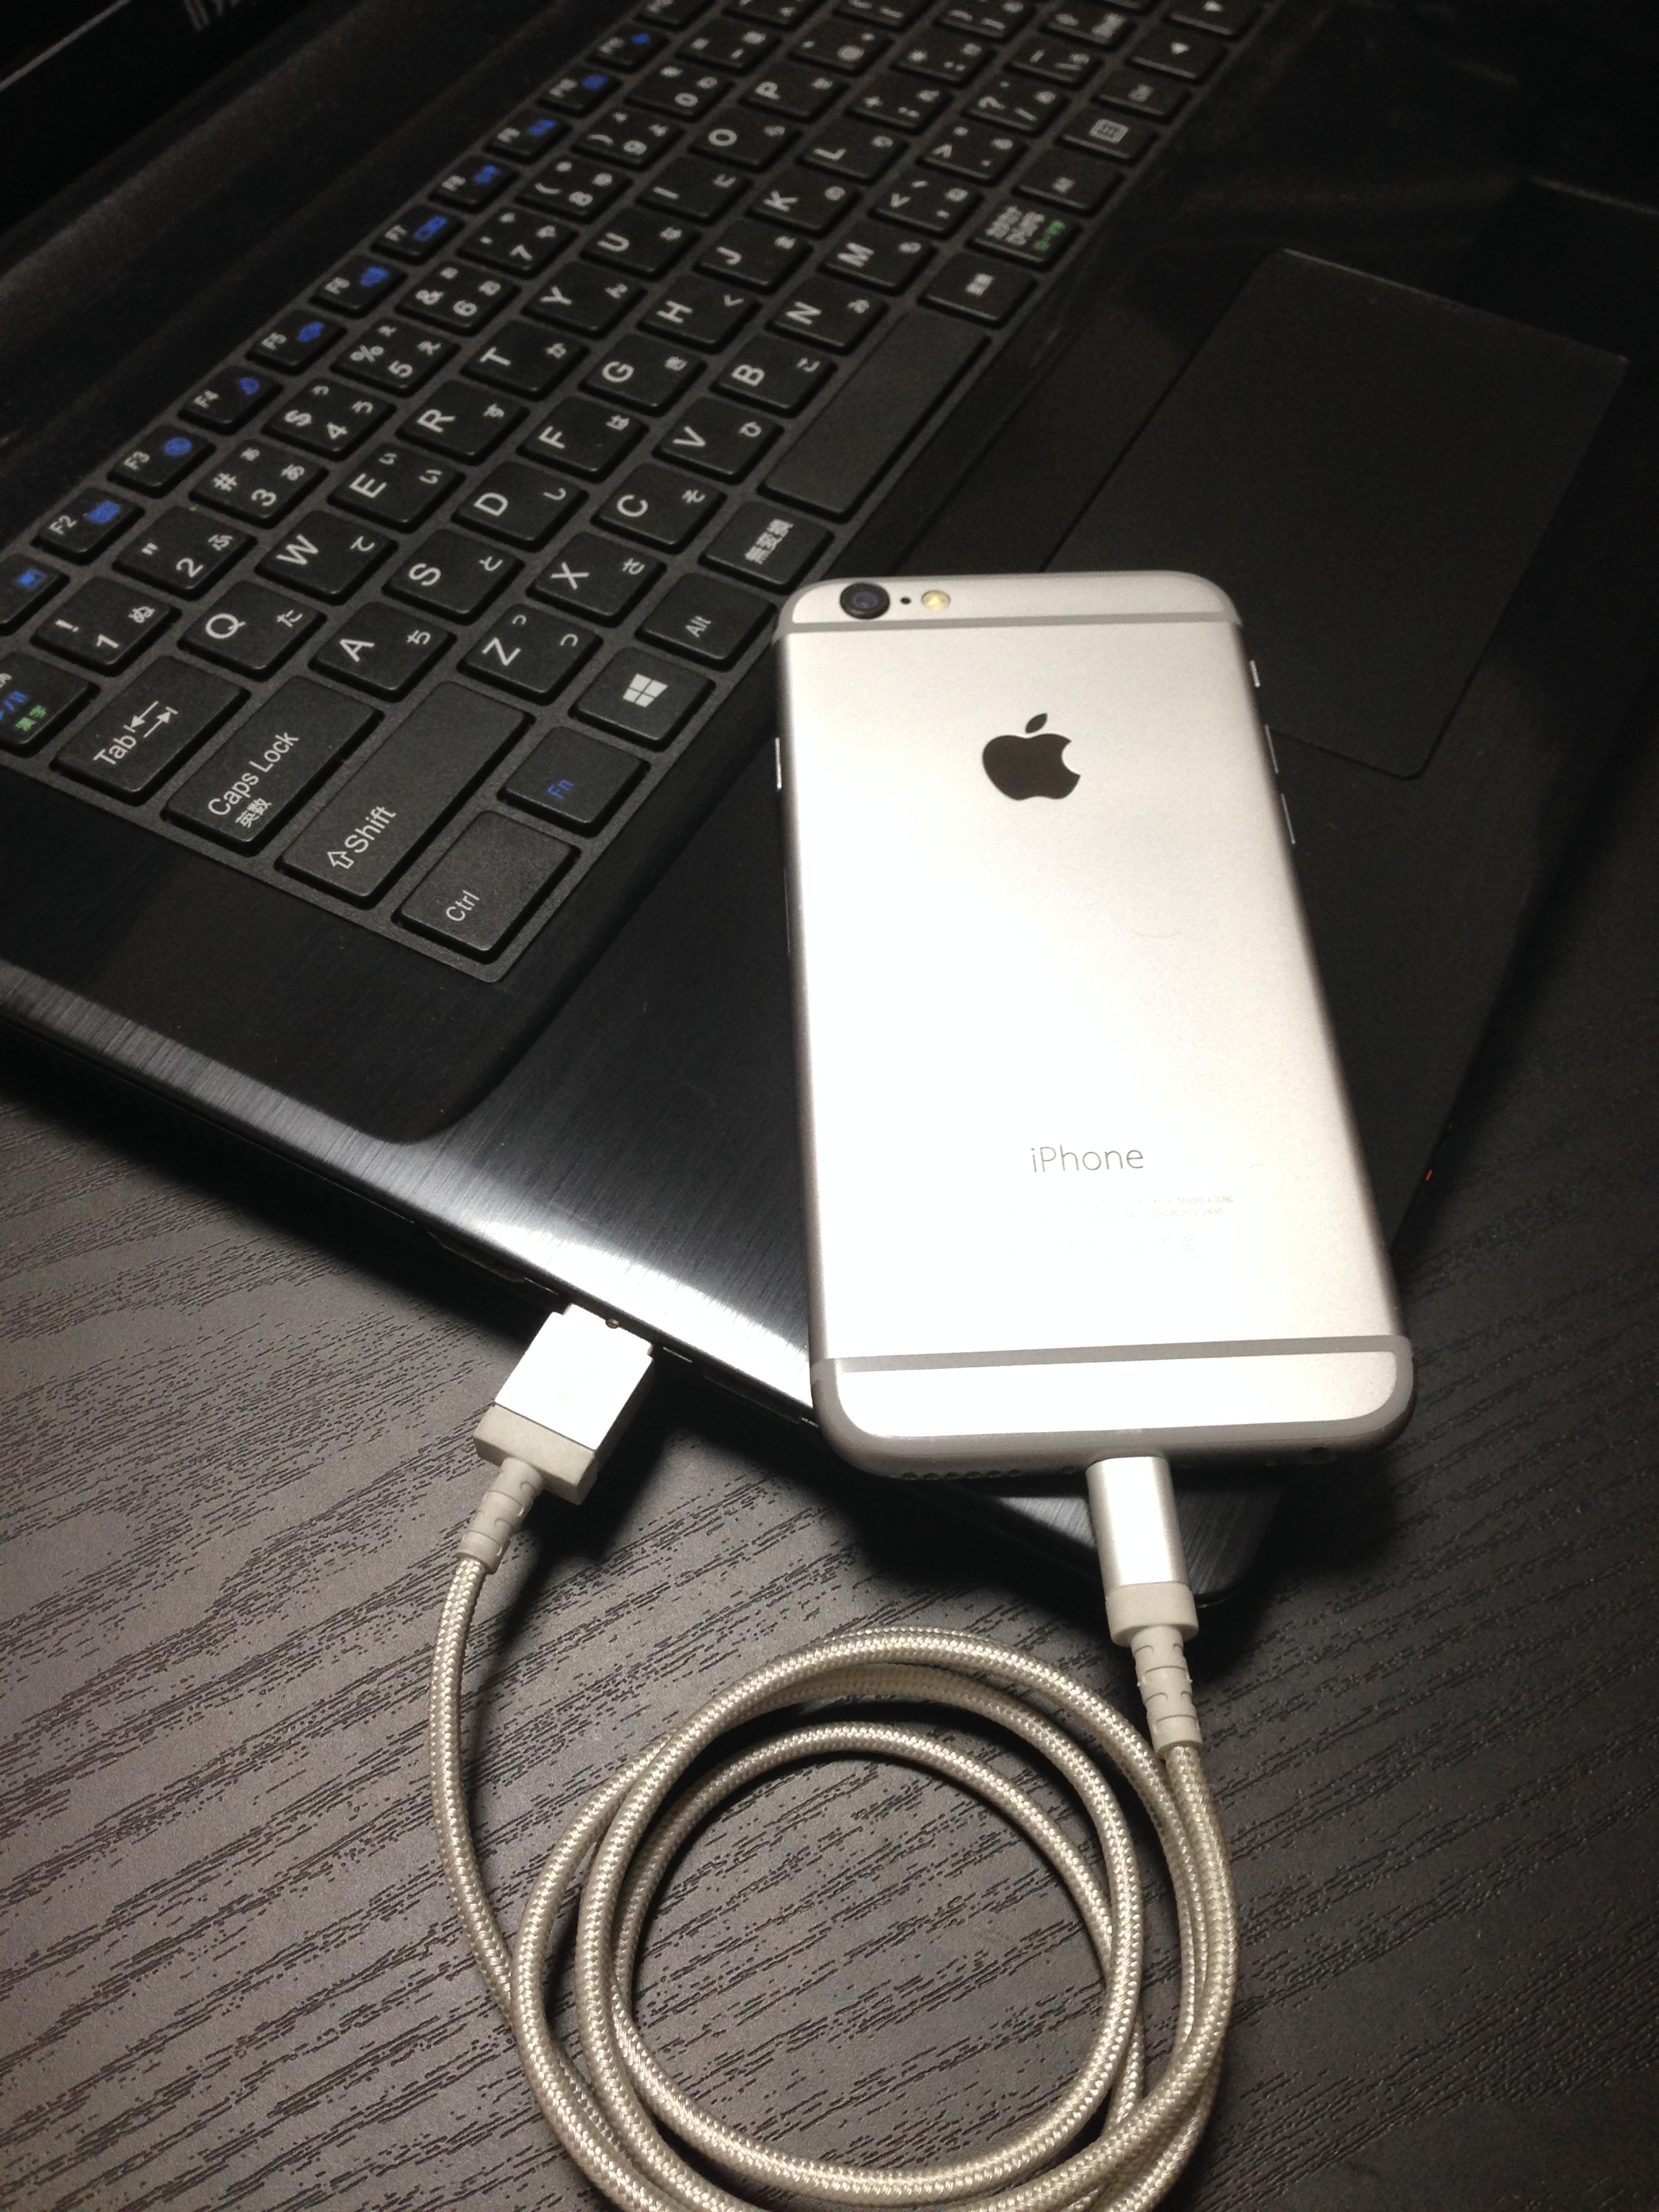 ②iPhoneをパソコンに接続